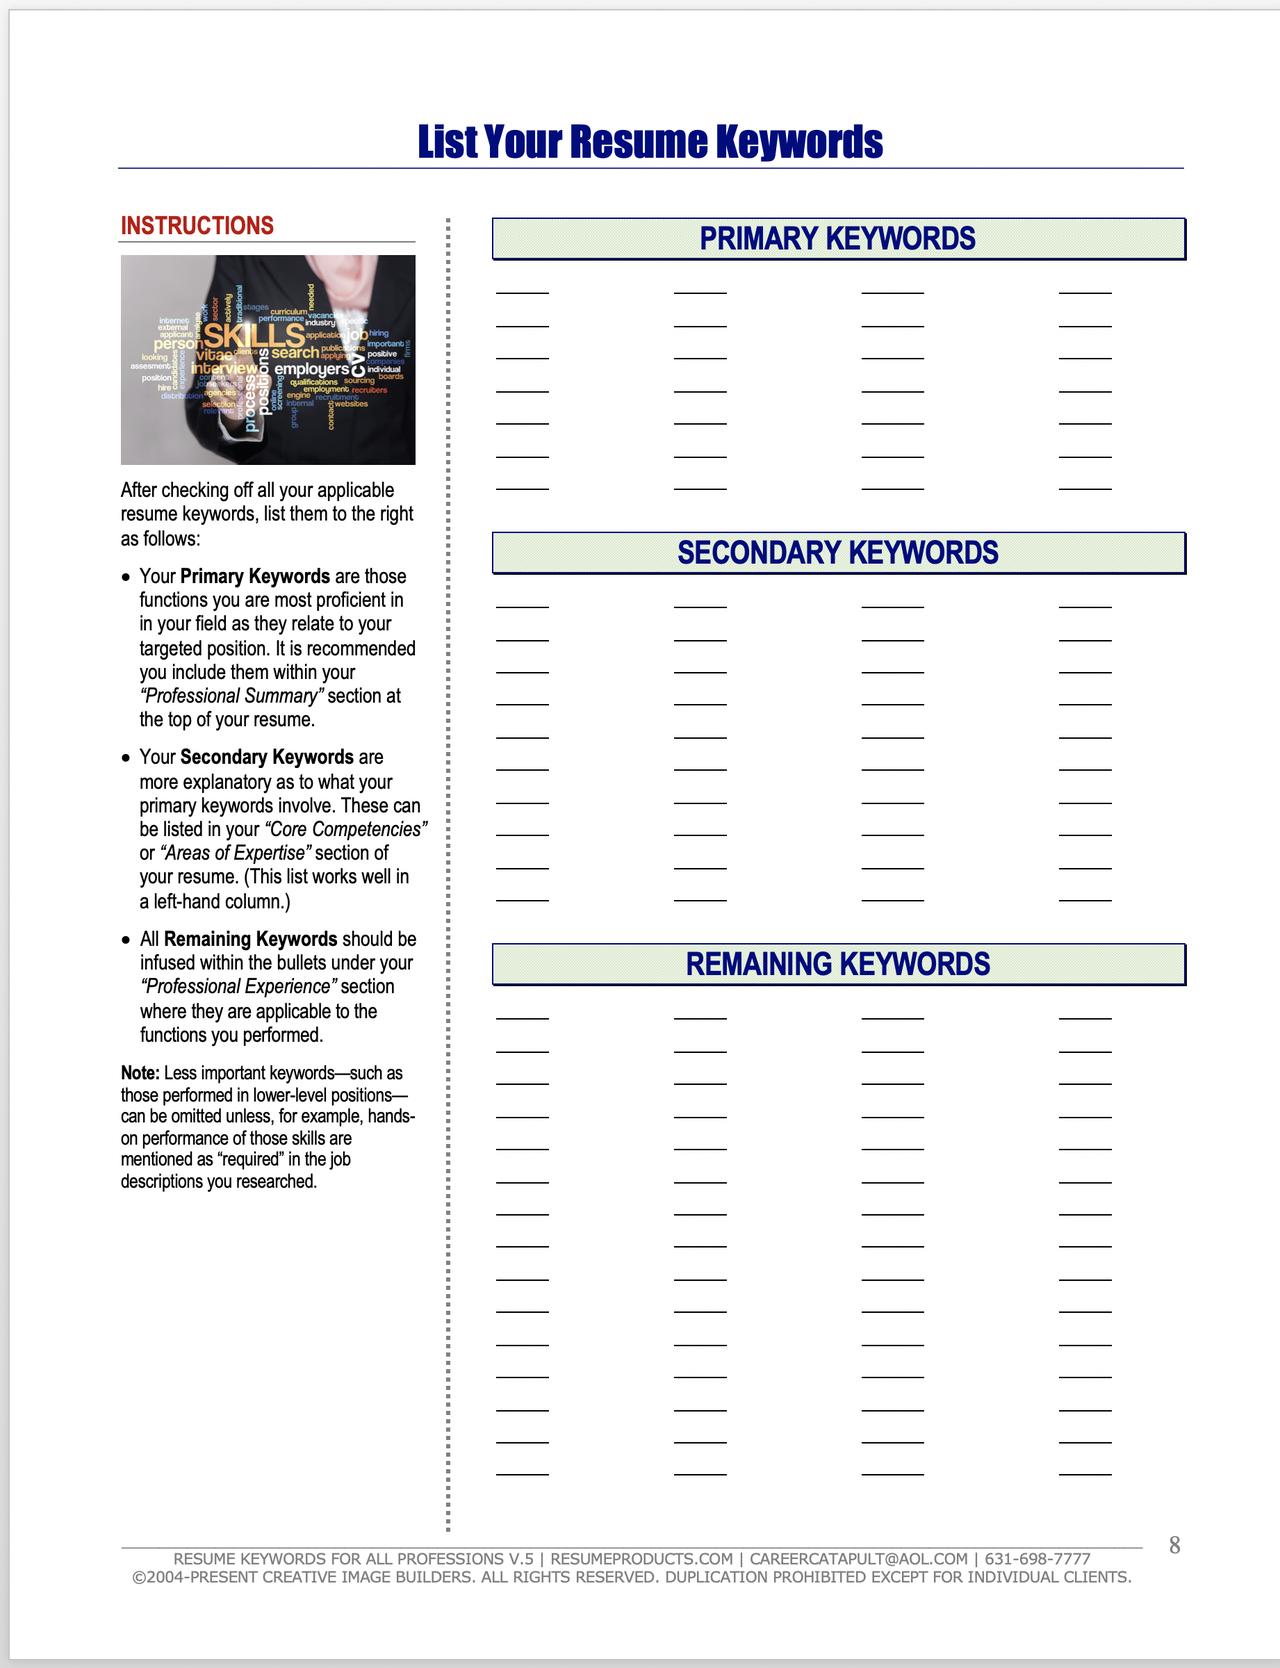 resume keywords - pg.8.png